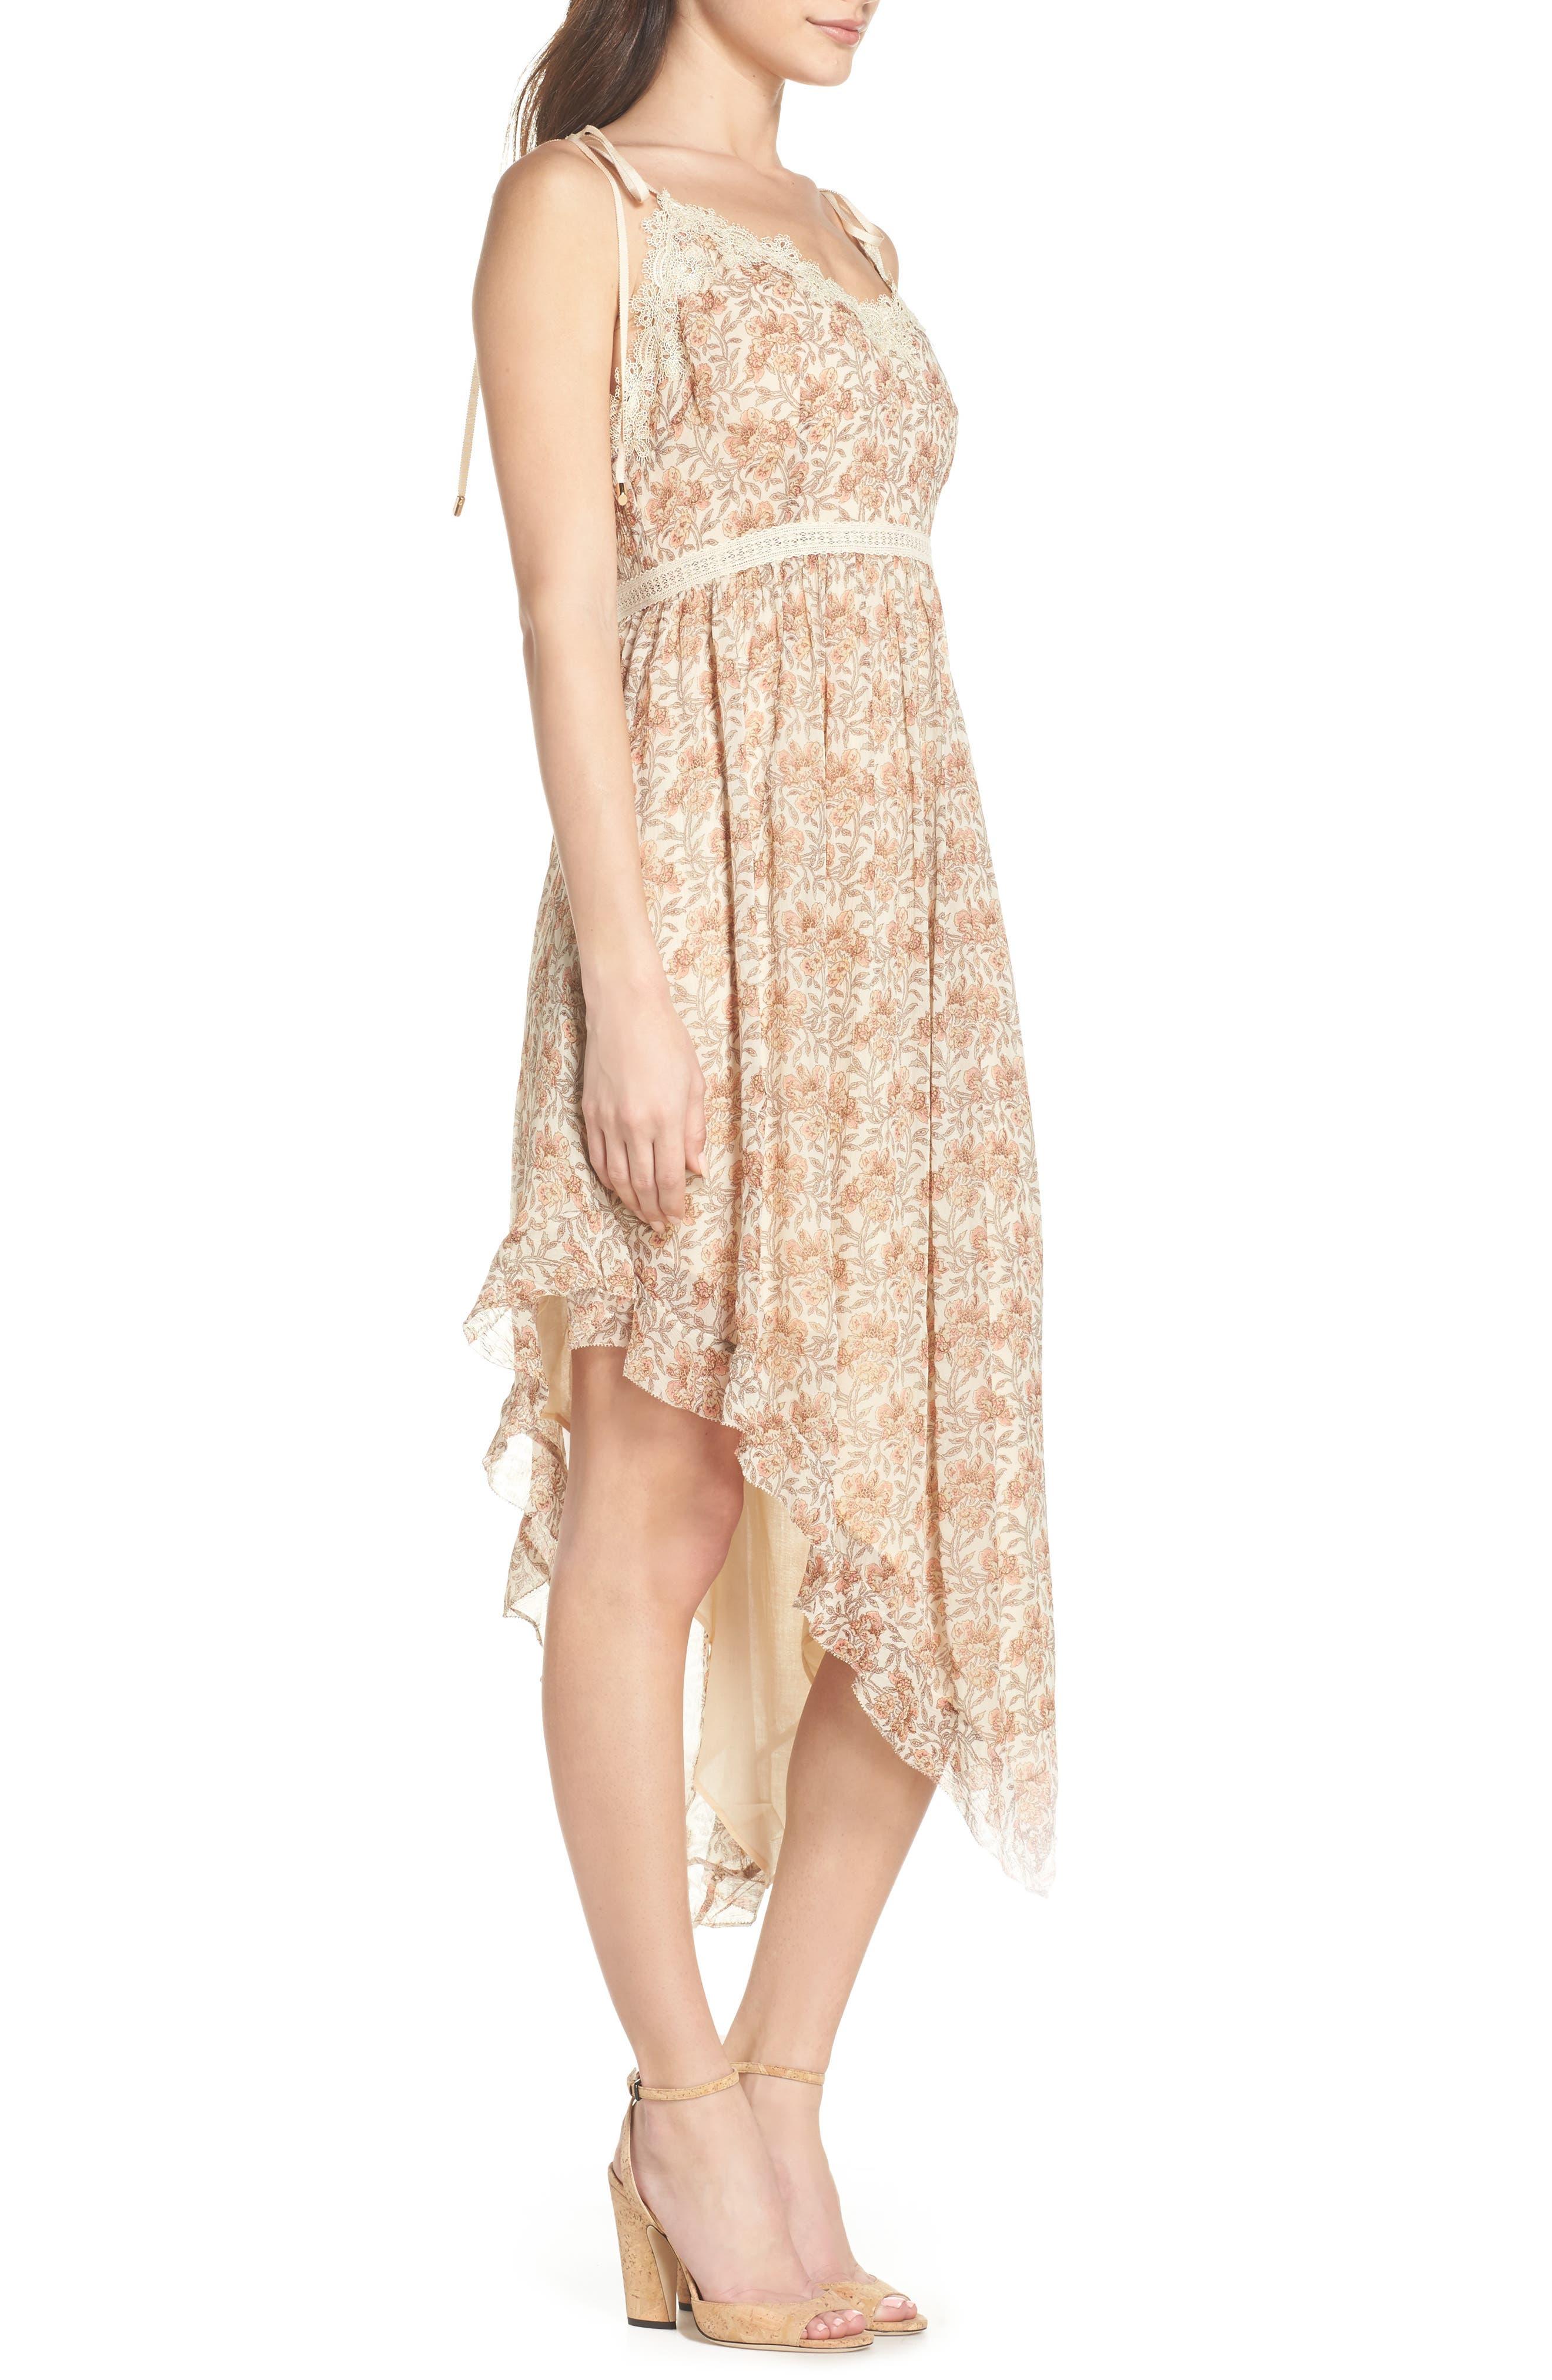 Aubrey Floral Print Dress,                             Alternate thumbnail 3, color,                             Desert Sunrise Floral